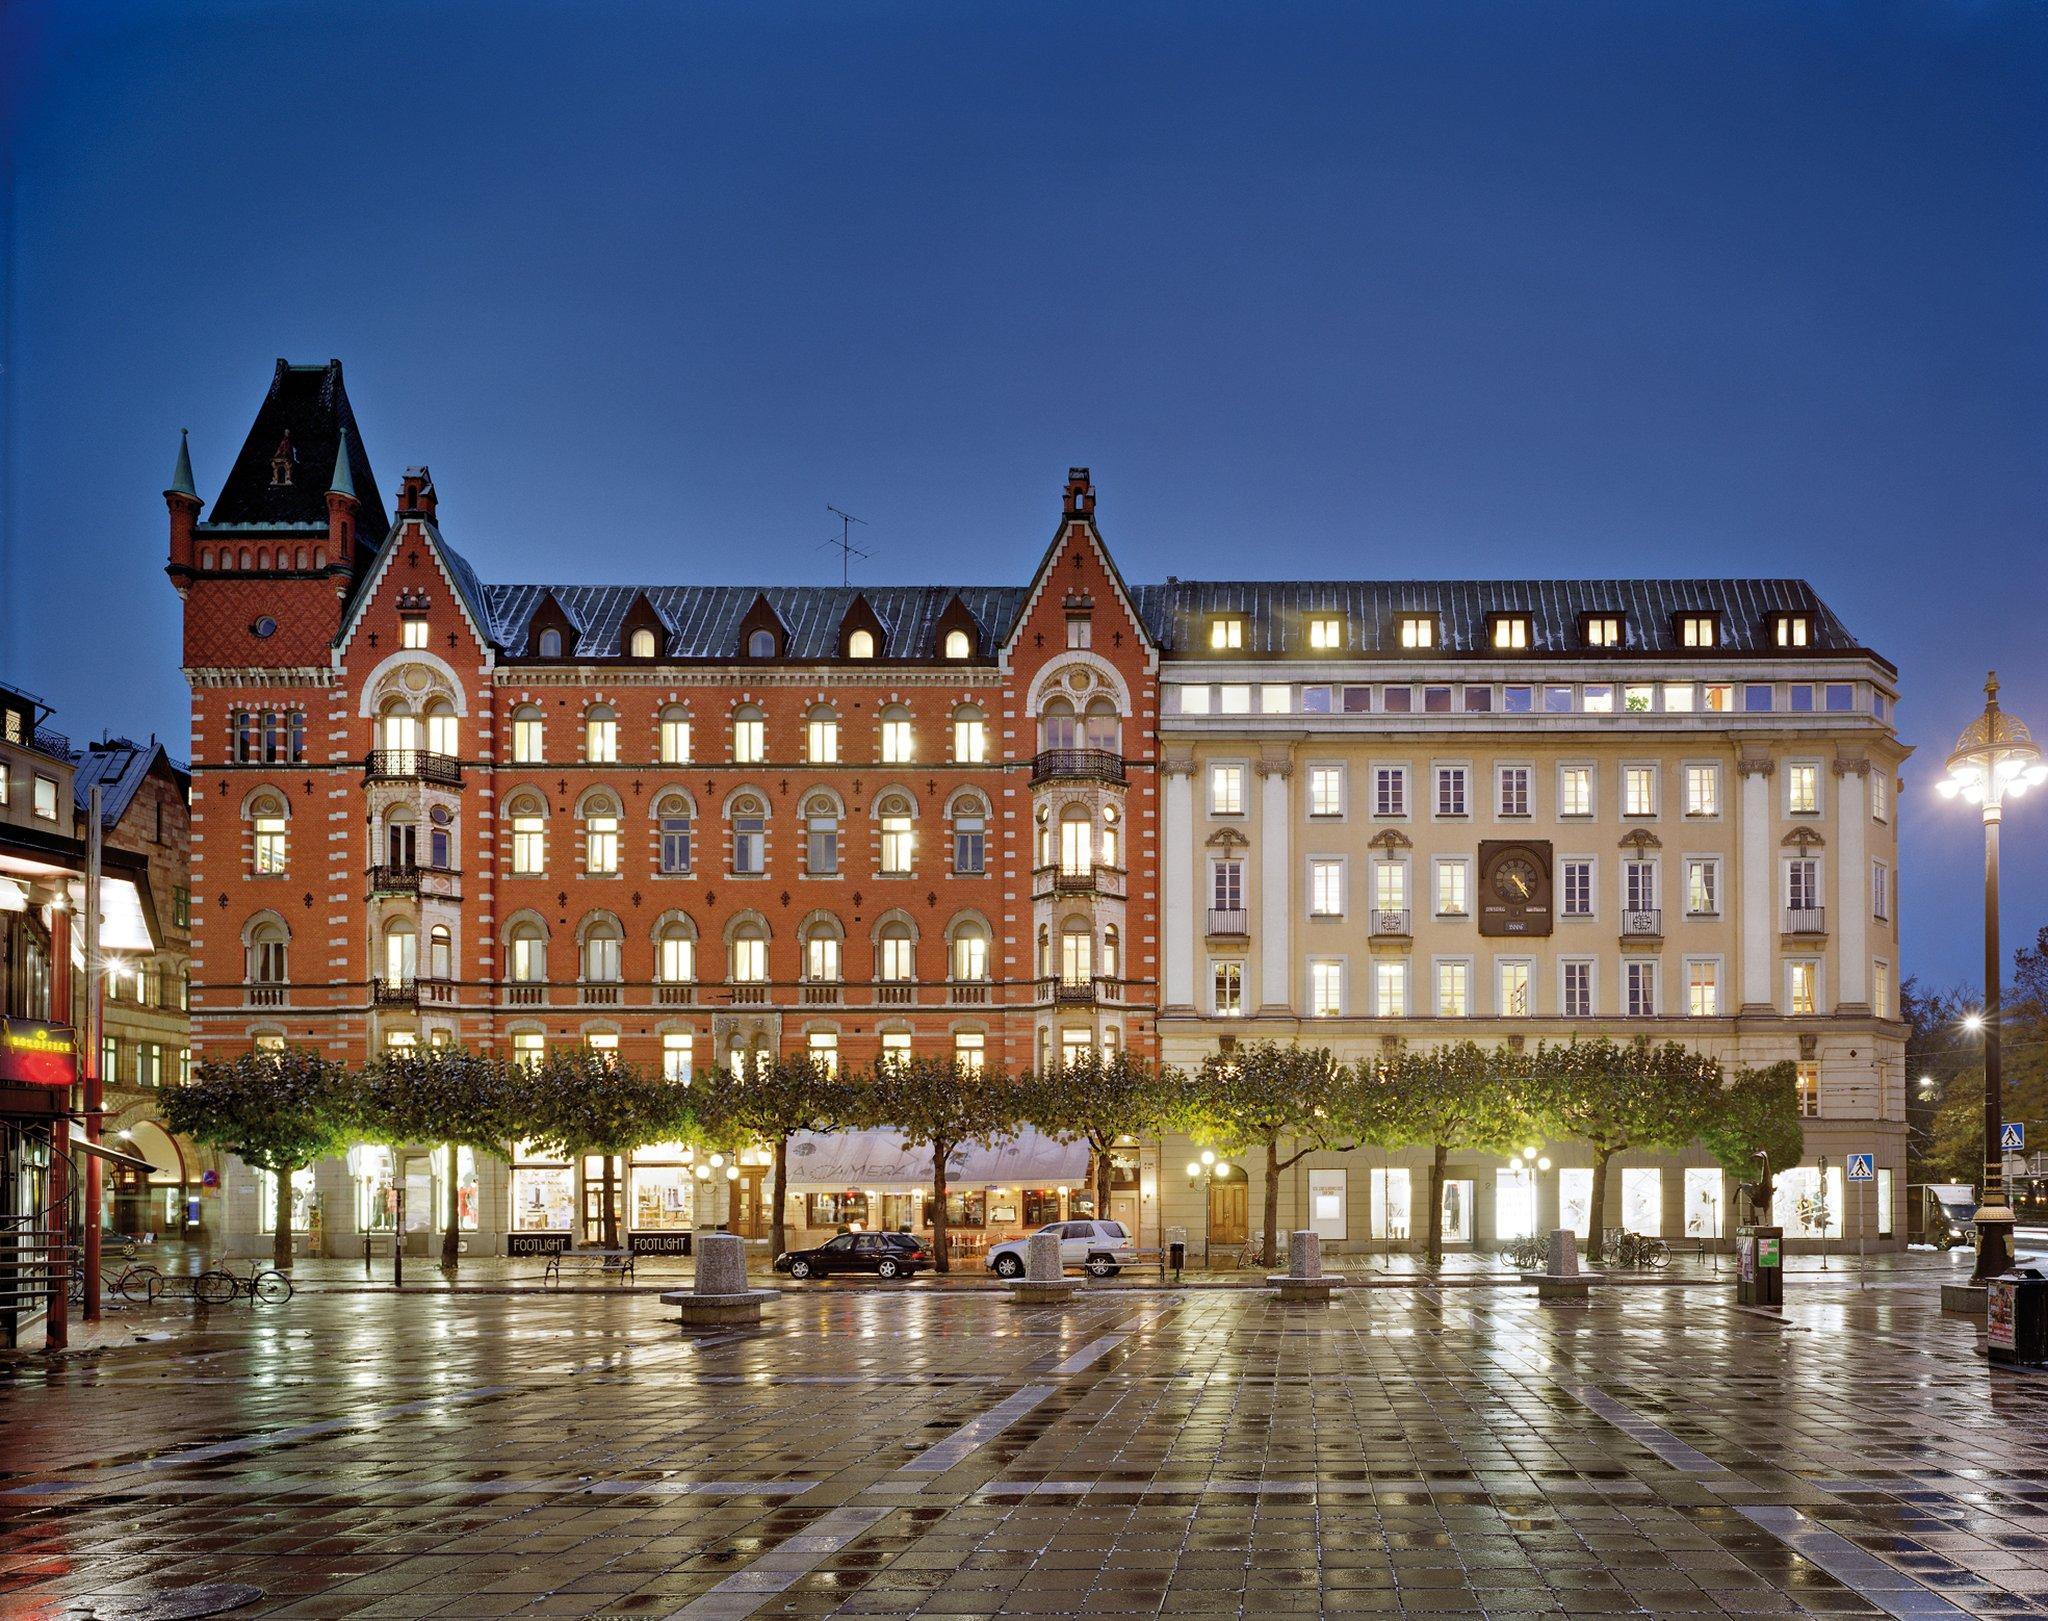 Nobis Hotel, a Member of Design Hotels